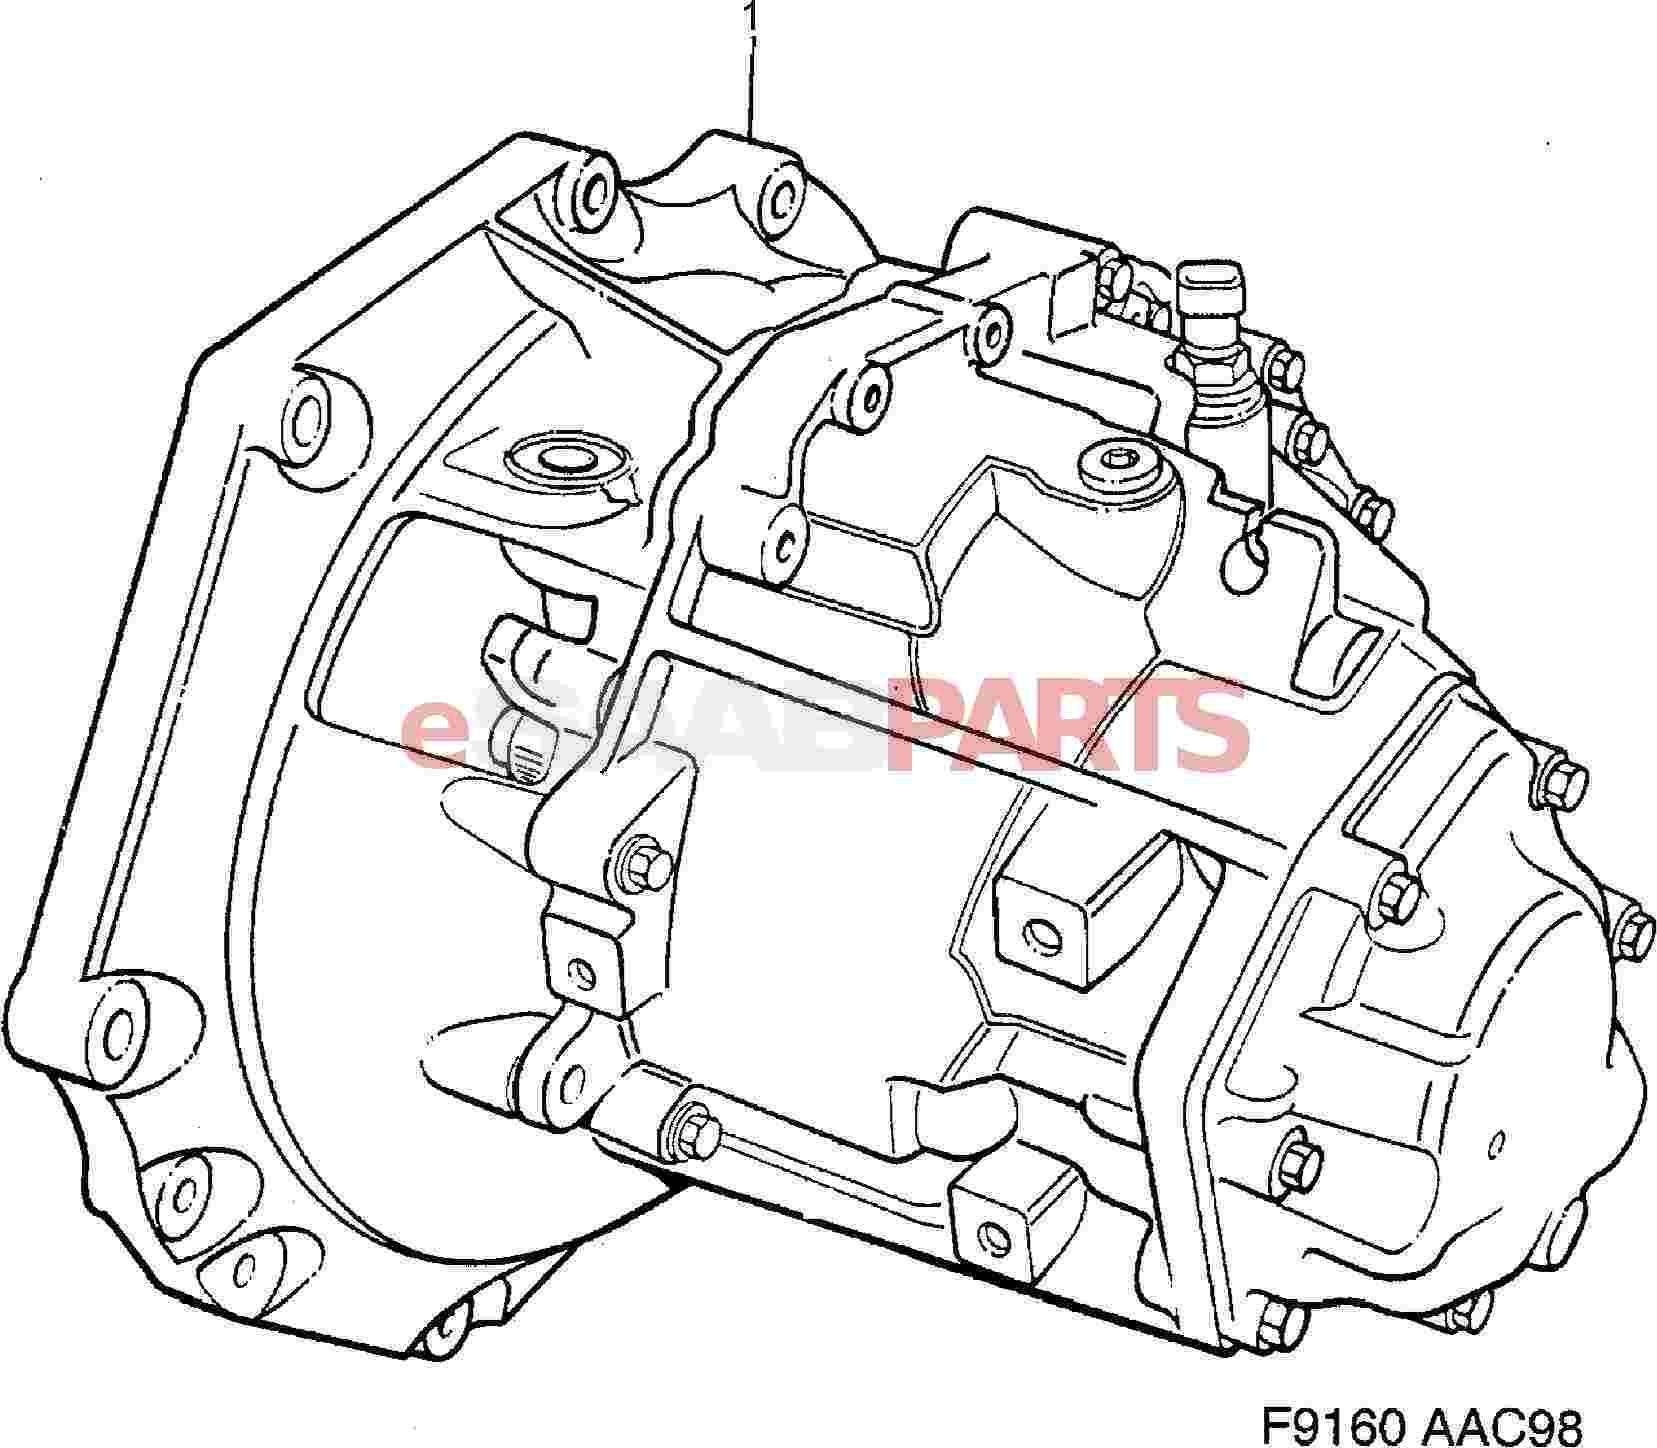 1999 Saab 9 5 Transmission Wiring Diagram. Saab. Auto